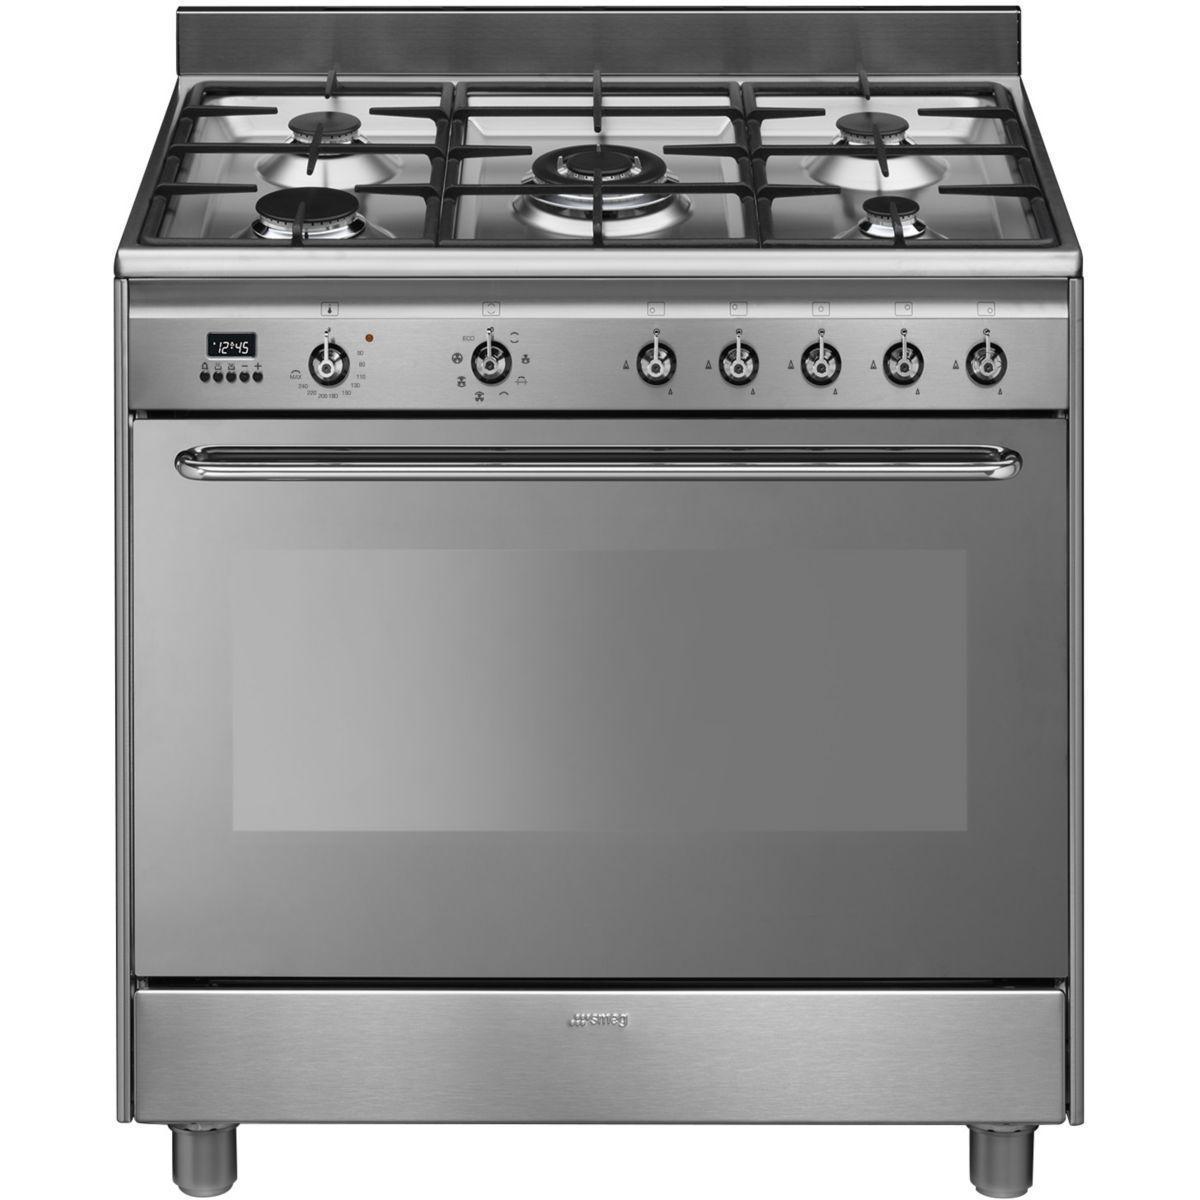 Pack promo cuisini�re gaz smeg cg90x9 + cr�dence smeg kit 90 x inox + hotte d�corative smeg kdc91xe (photo)